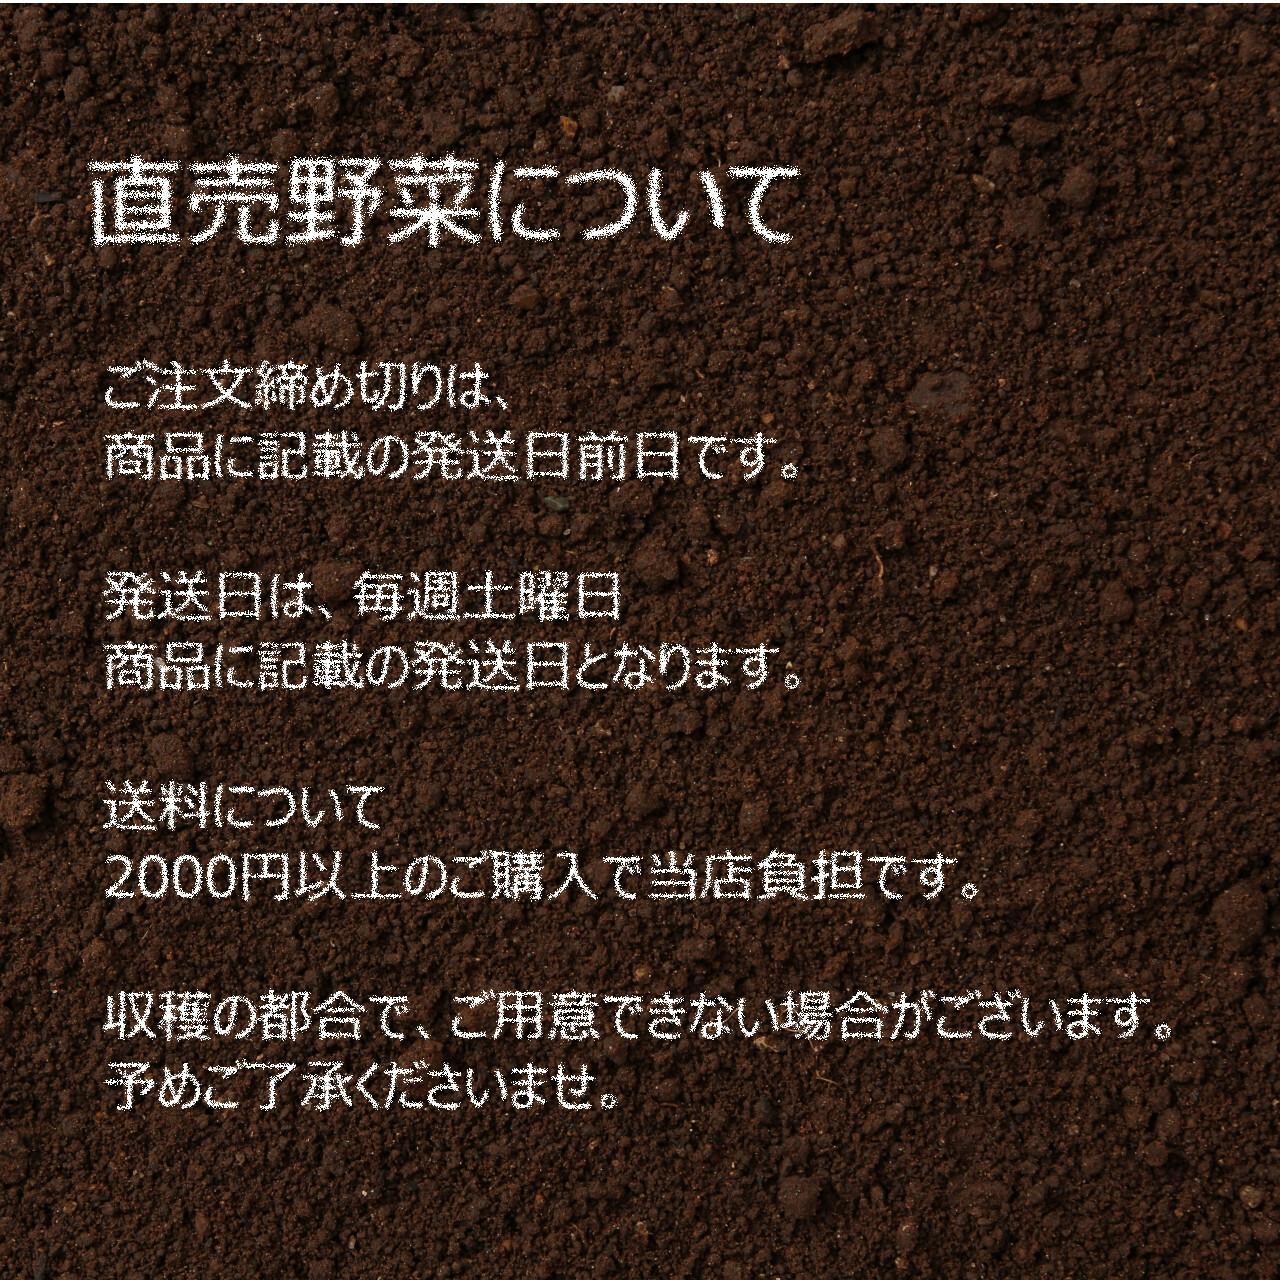 大根菜 約300g : 6月の朝採り直売野菜 6月15日発送予定